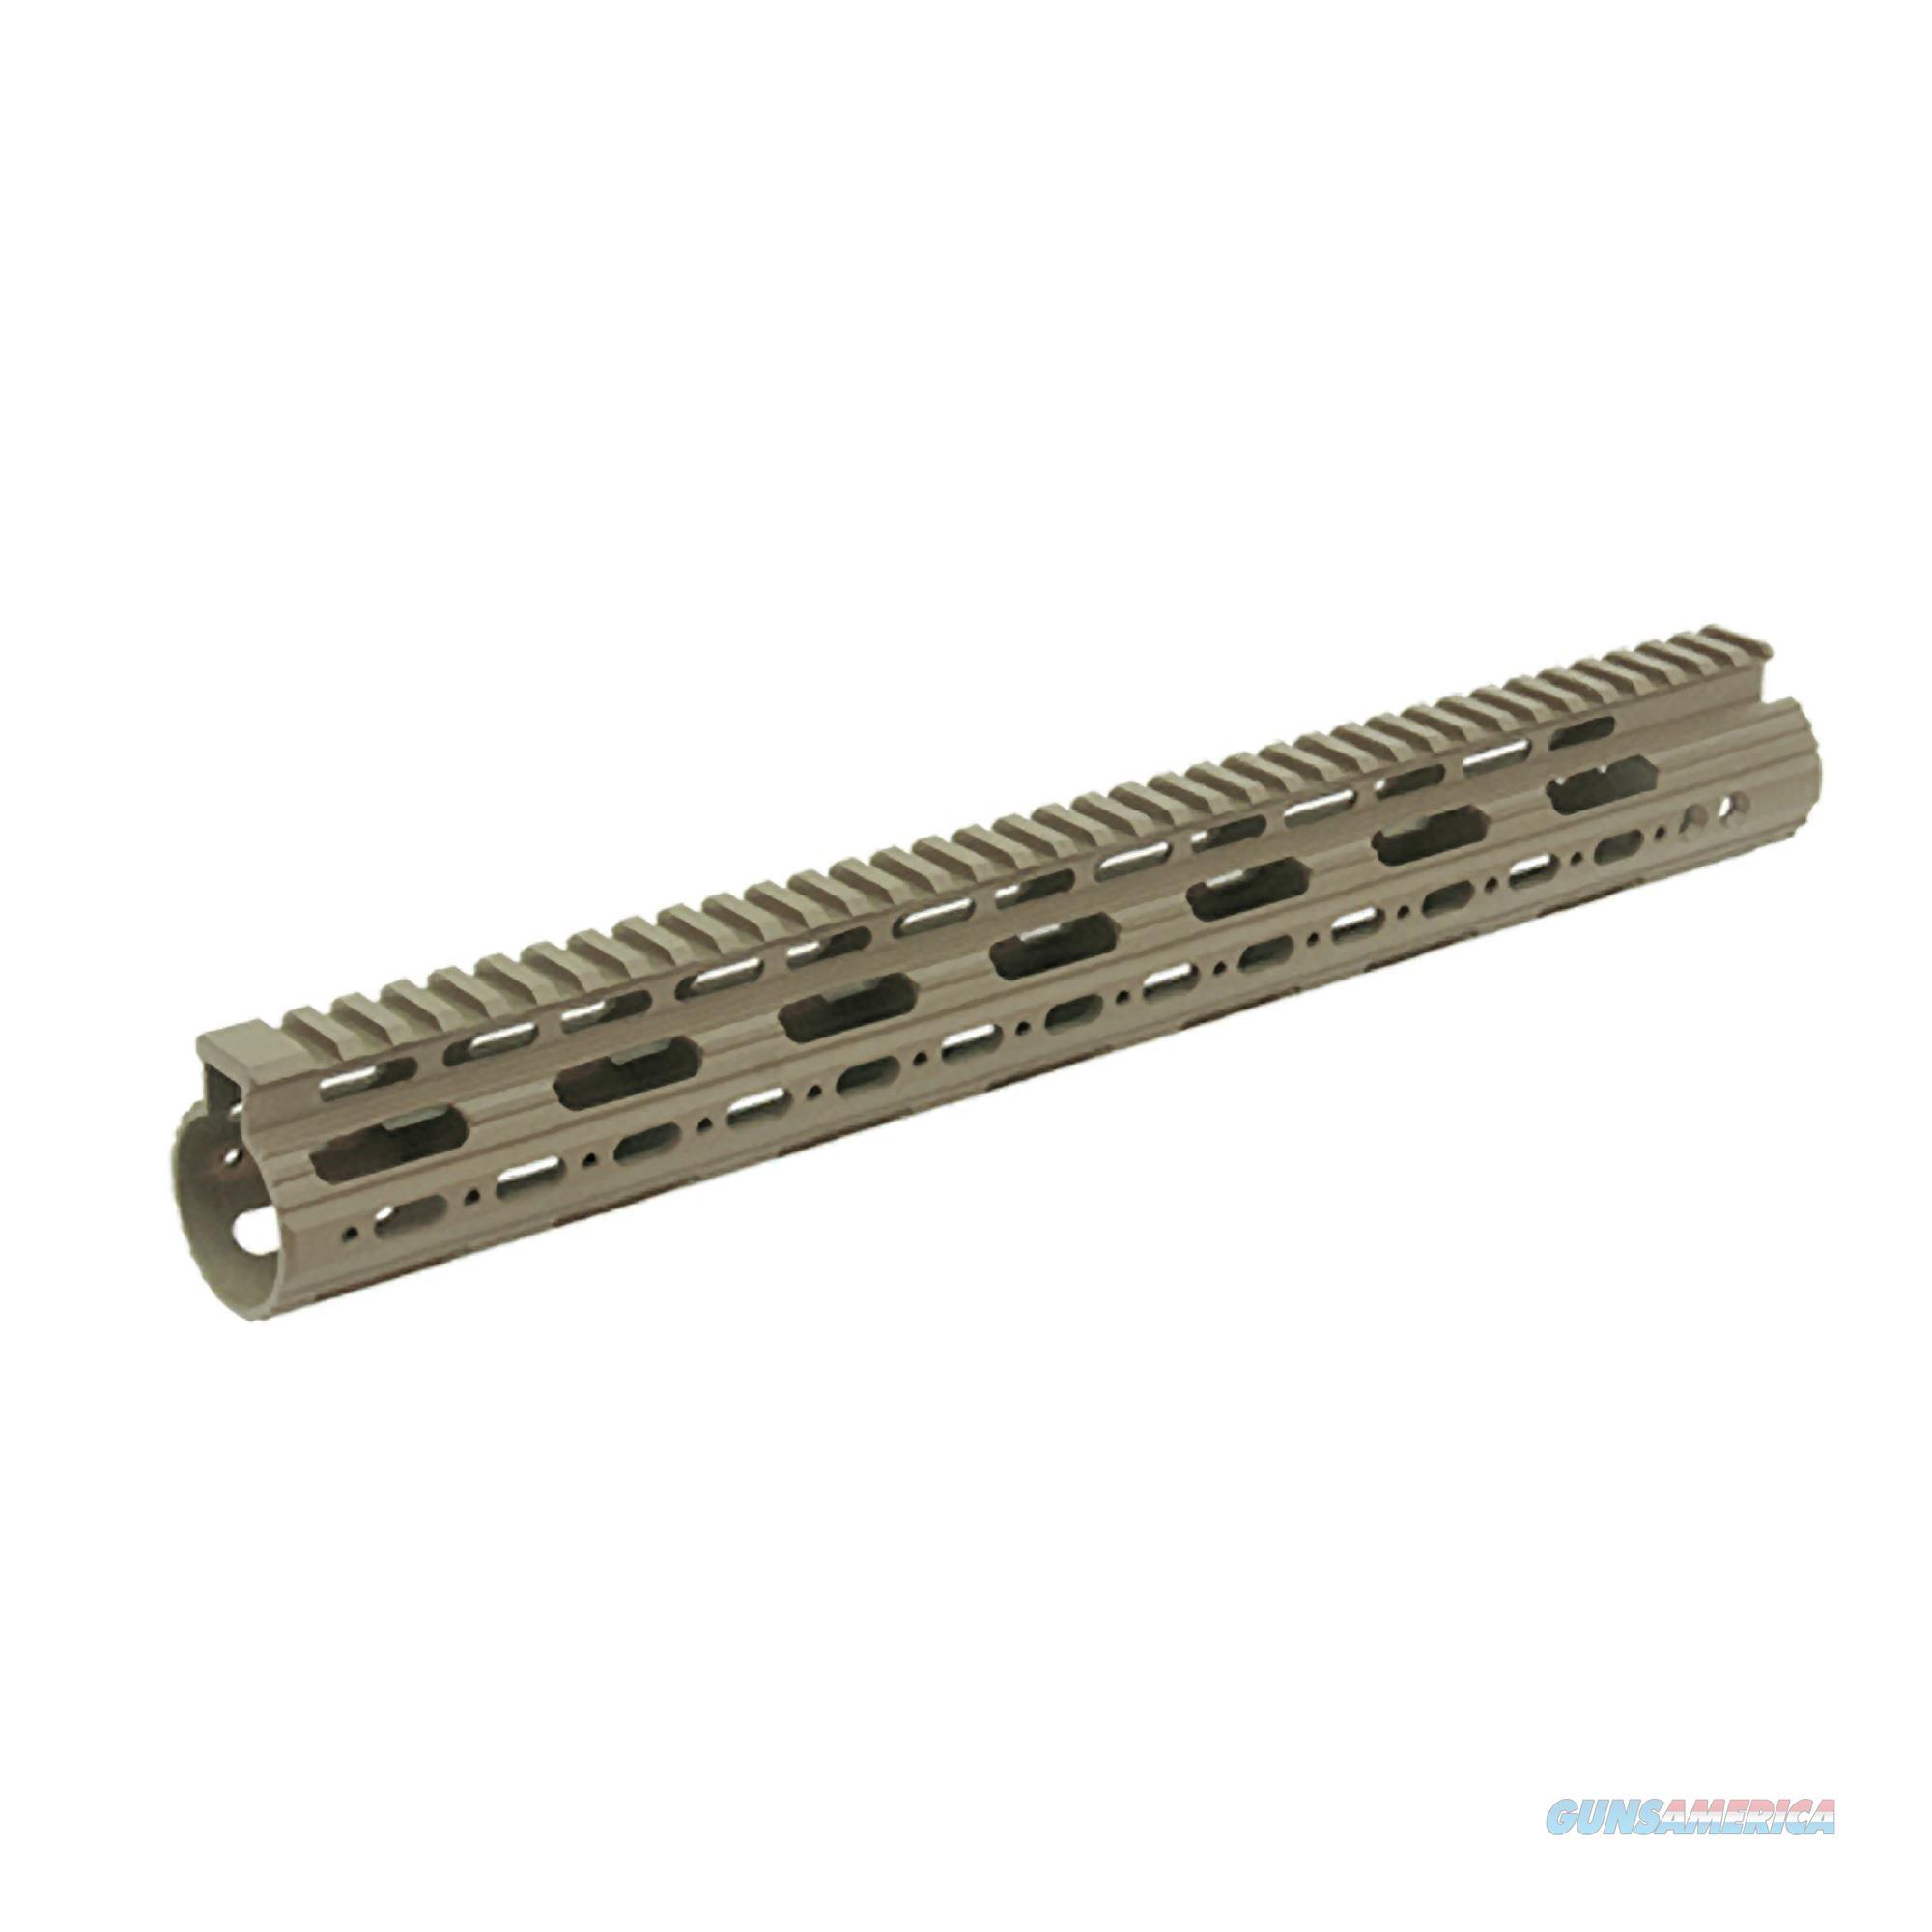 Leapers Inc (Utg) Ar15 Super Slim Free Float Handguard MTU019SSD  Non-Guns > Gunstocks, Grips & Wood